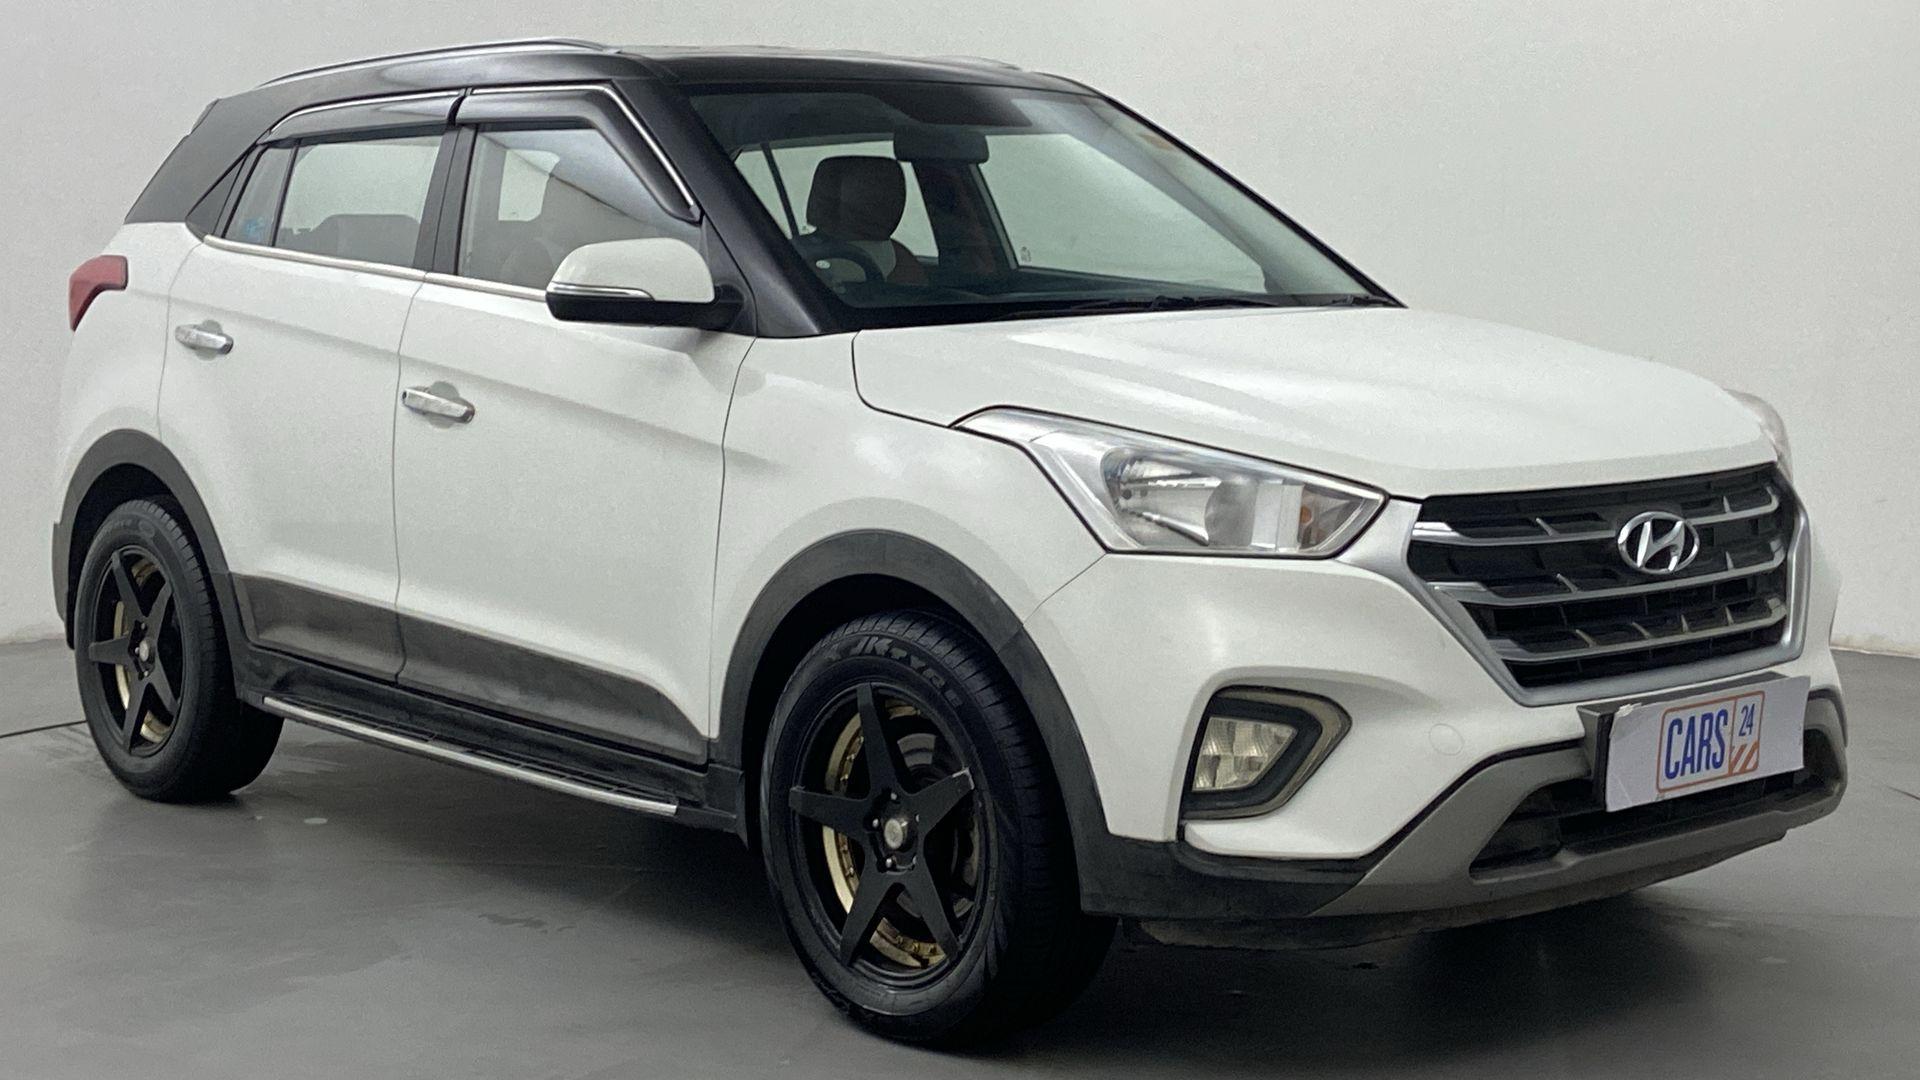 2018 Hyundai Creta